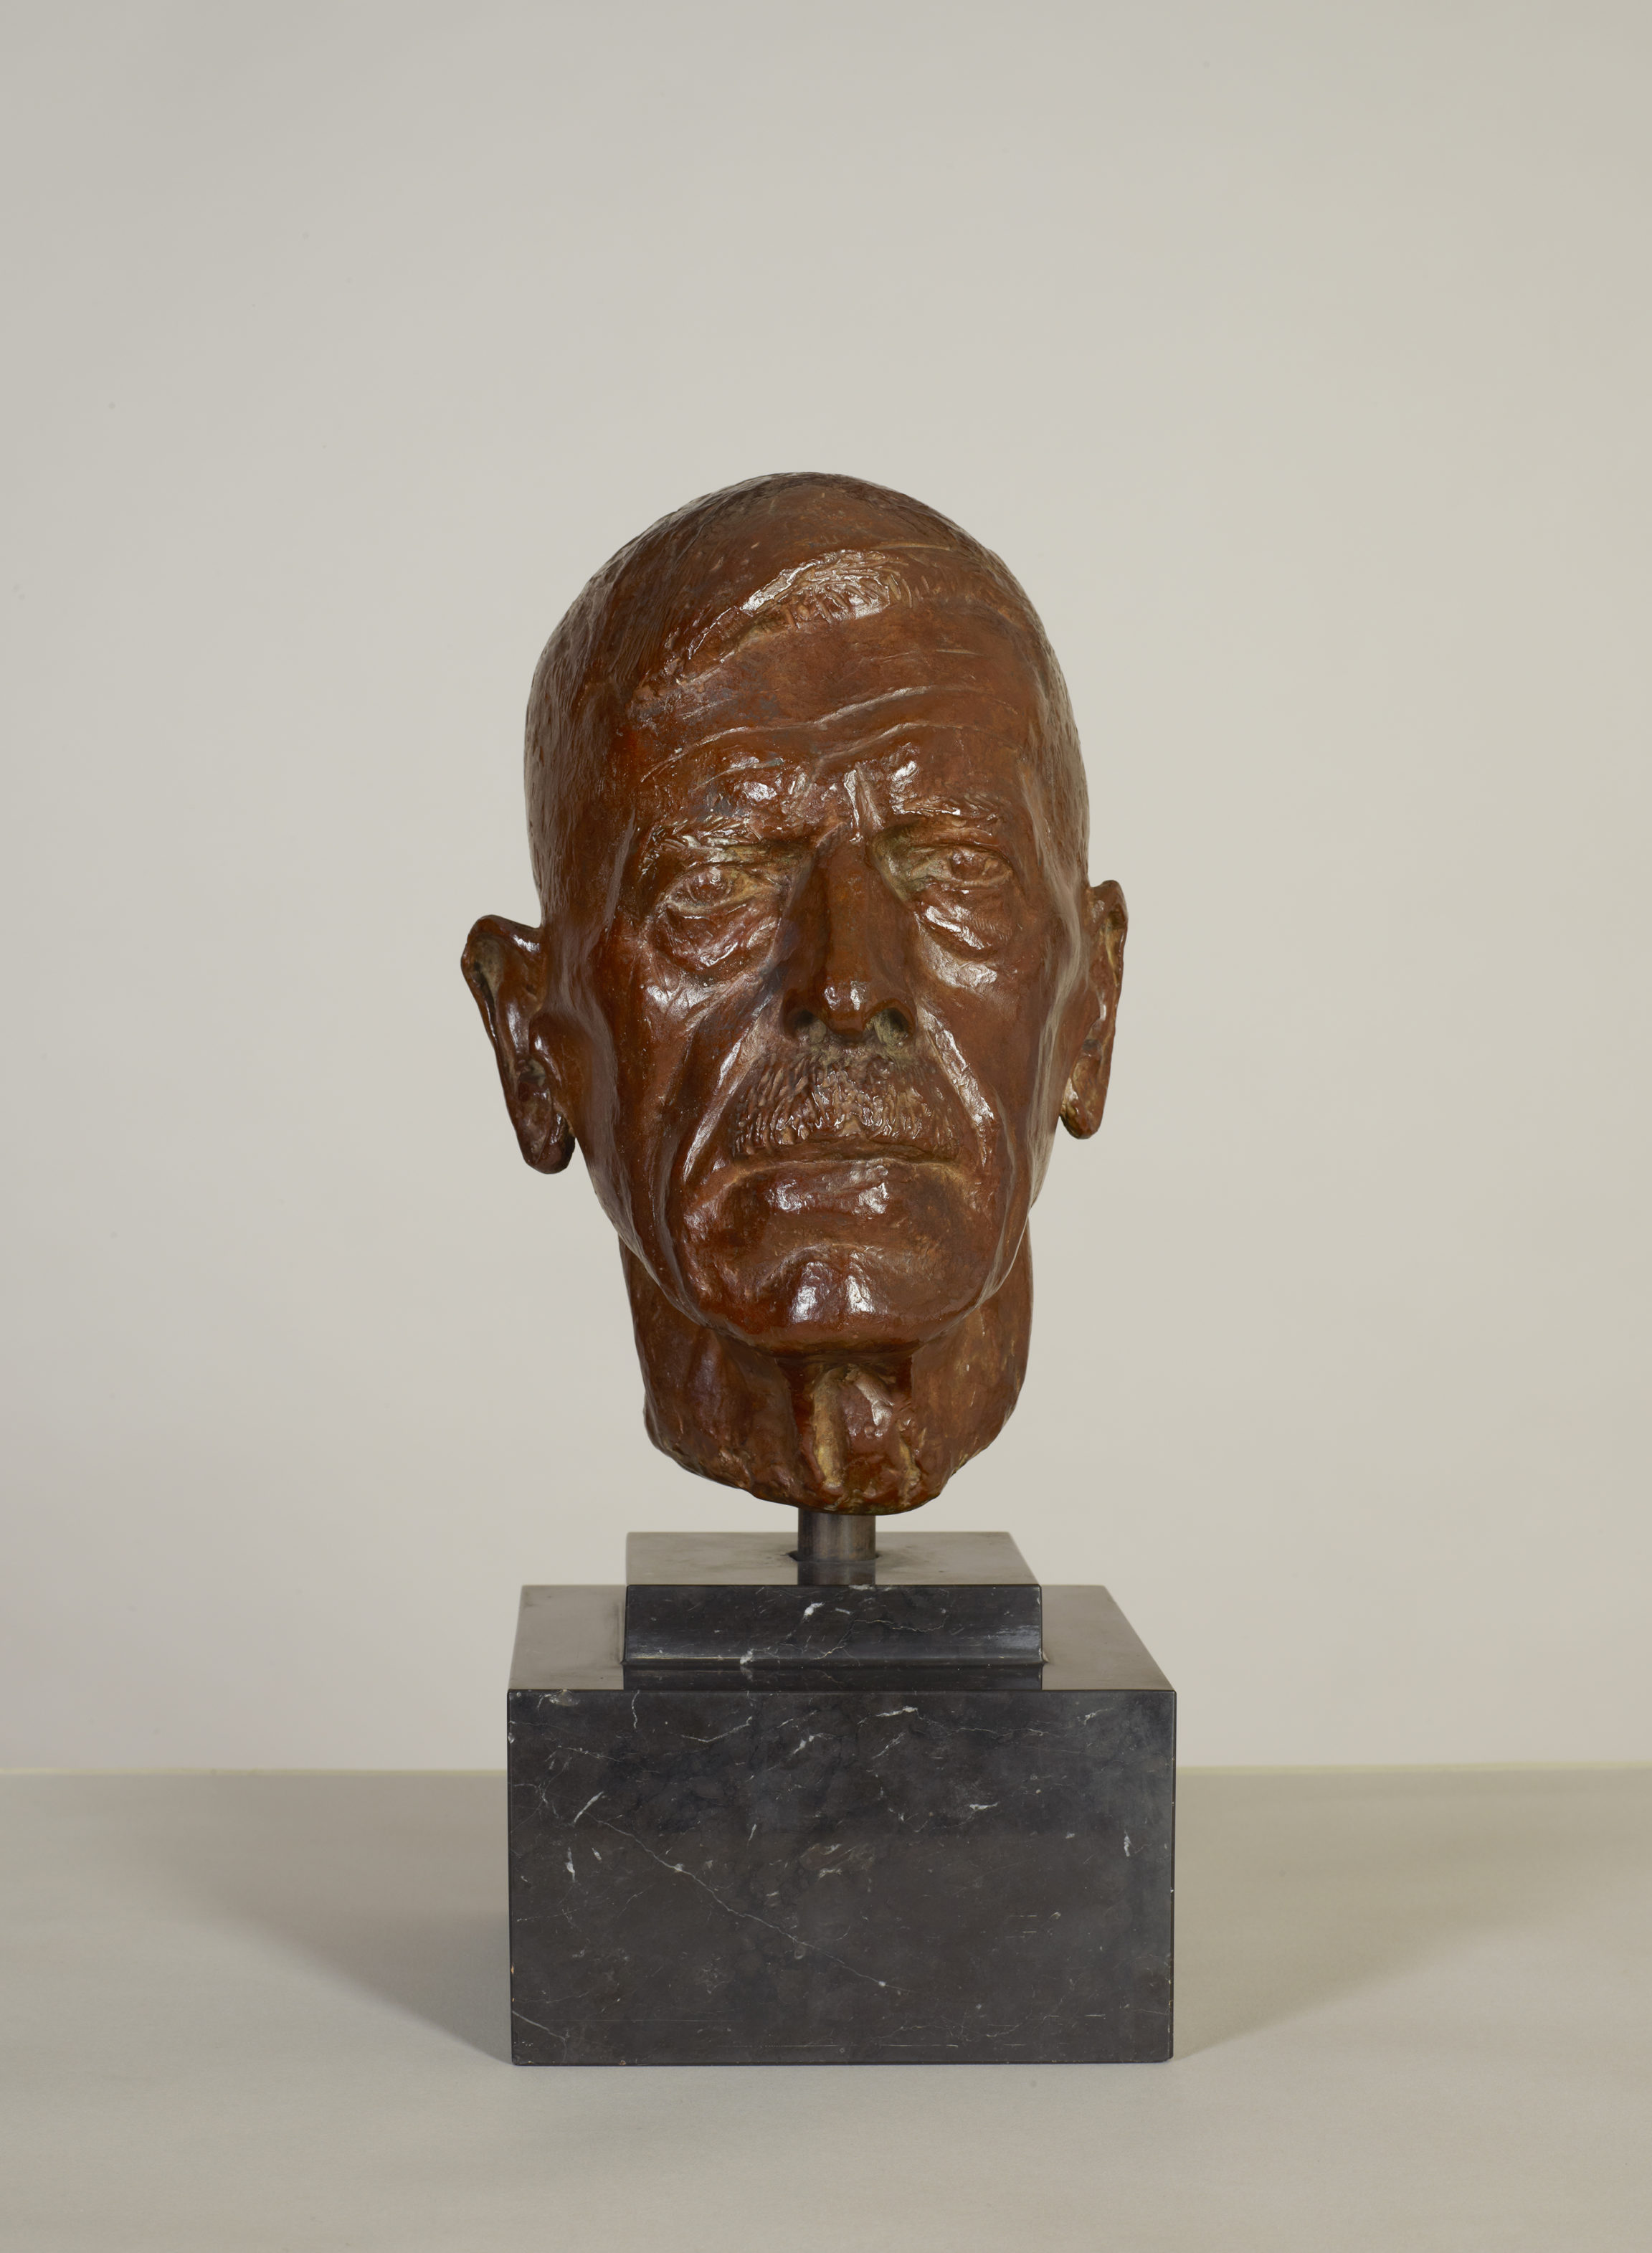 Otto Charles Bänninger , Buste de Charles-Ferdinand Ramuz, 1942